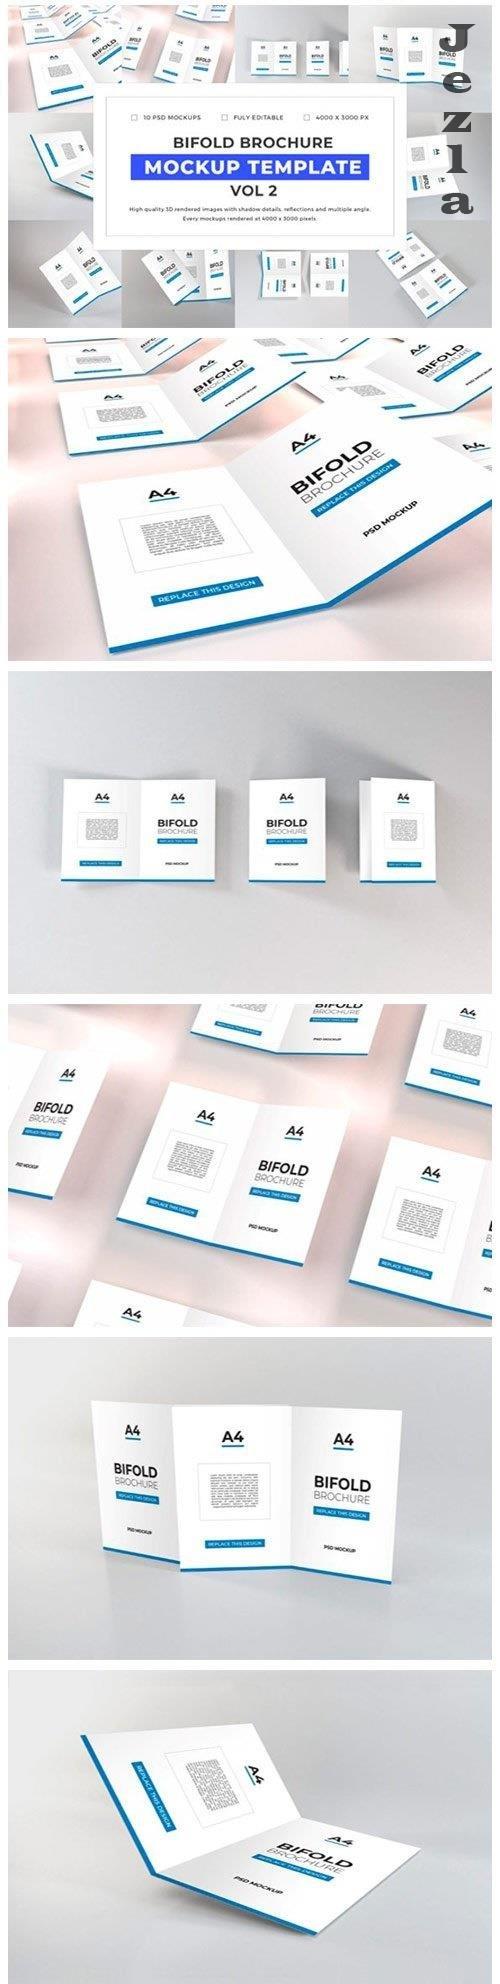 Bifold Brochure Mockup Template Bundle Vol 2 - 1058199